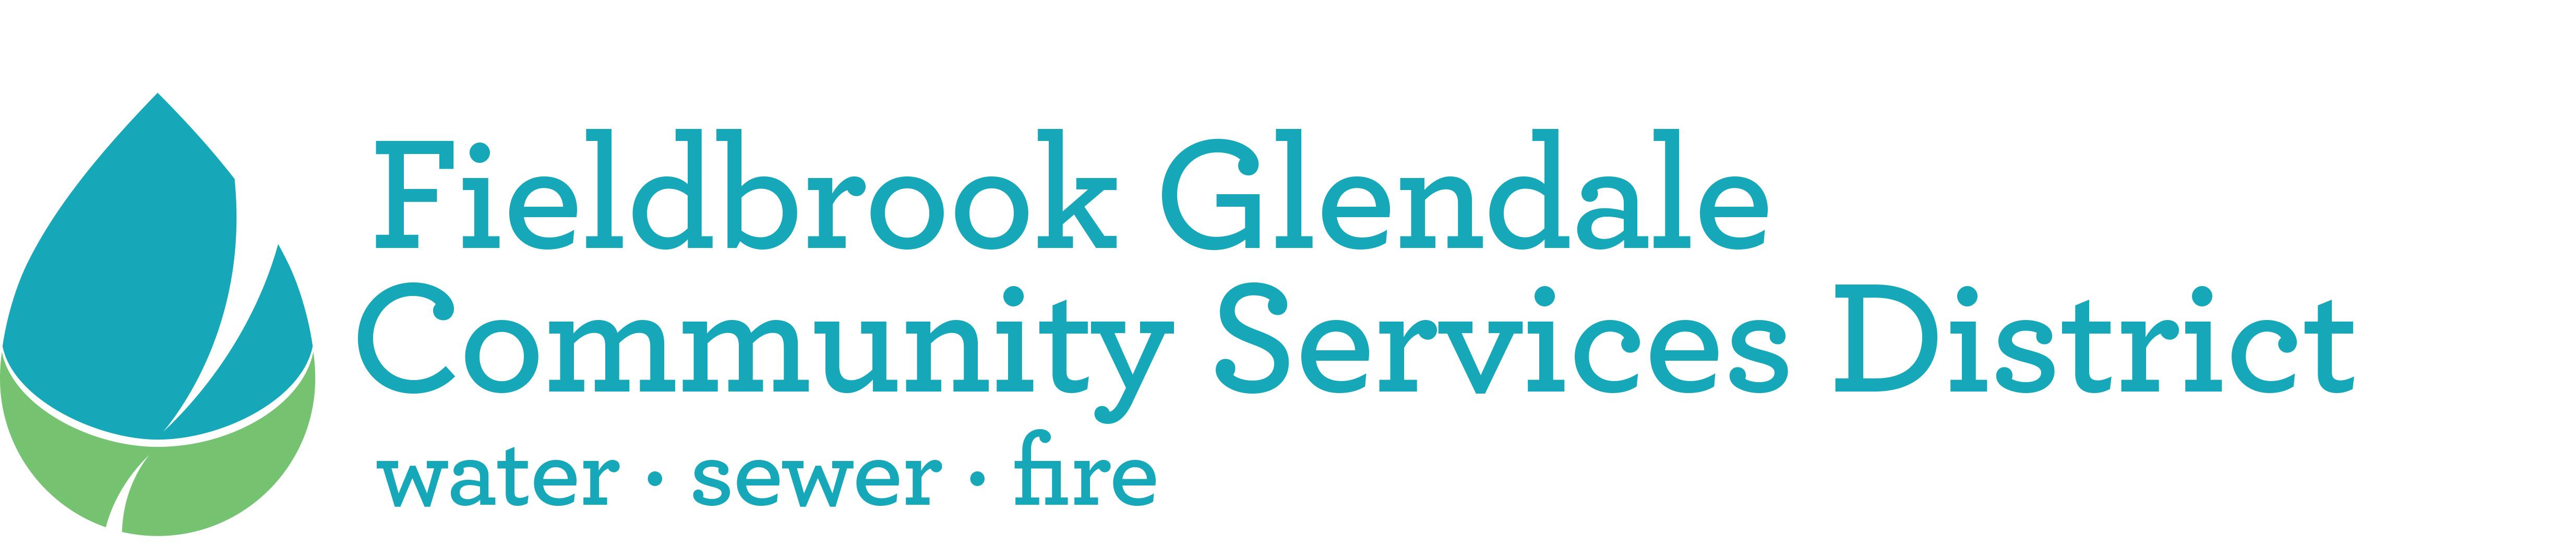 Fieldbrook Glendale Community Services District